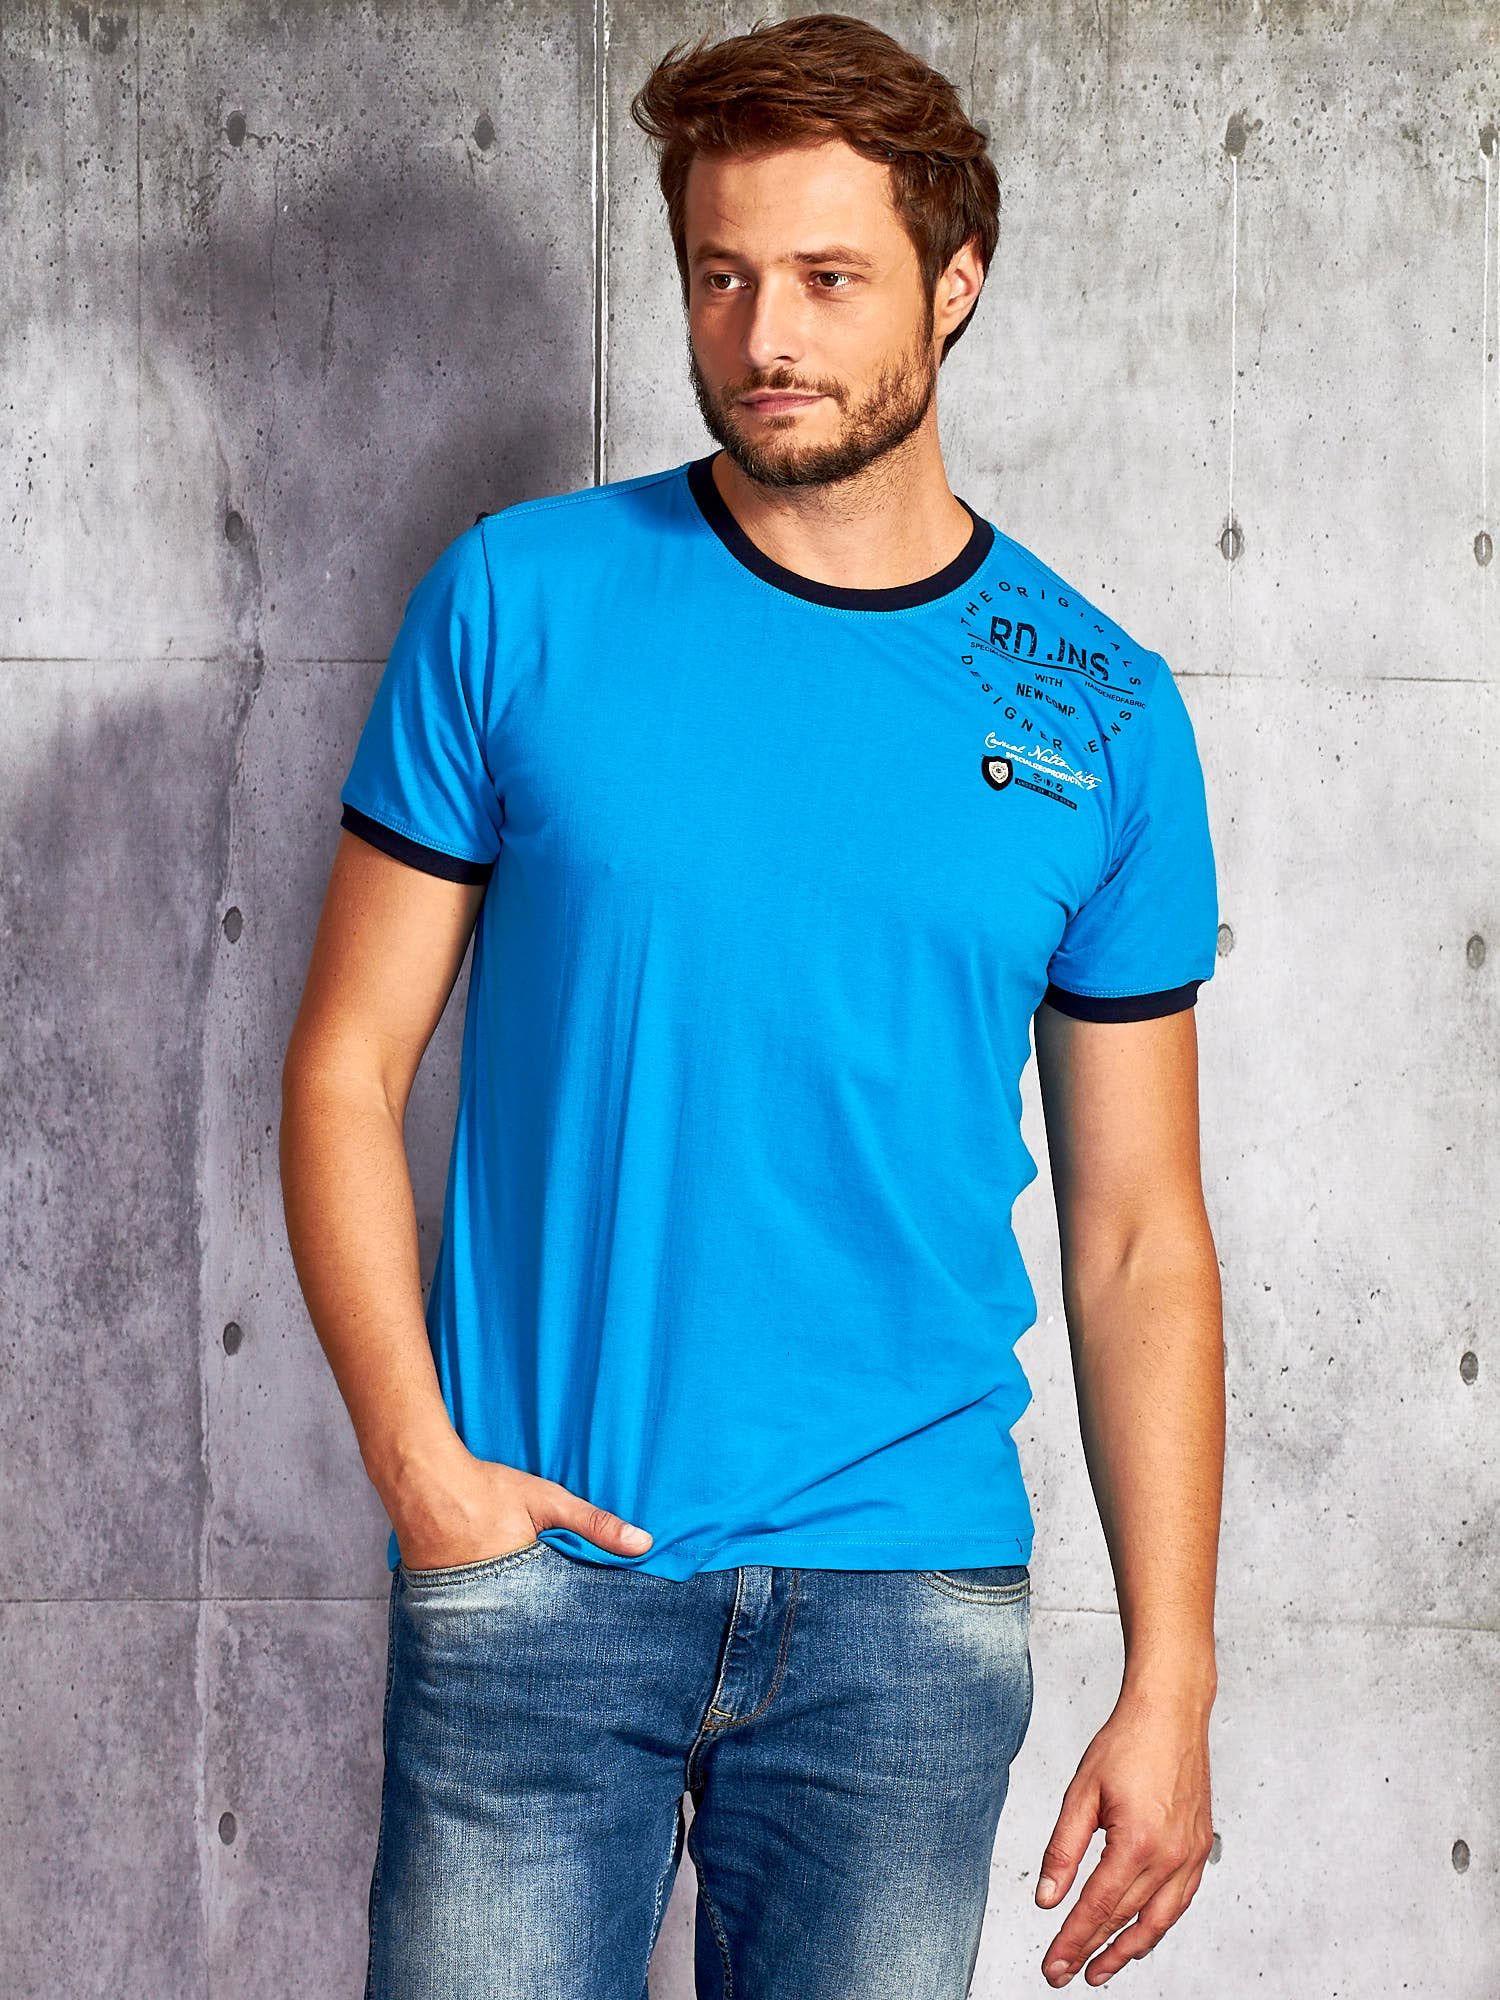 koszulki męskie Sklep internetowy z koszulkami